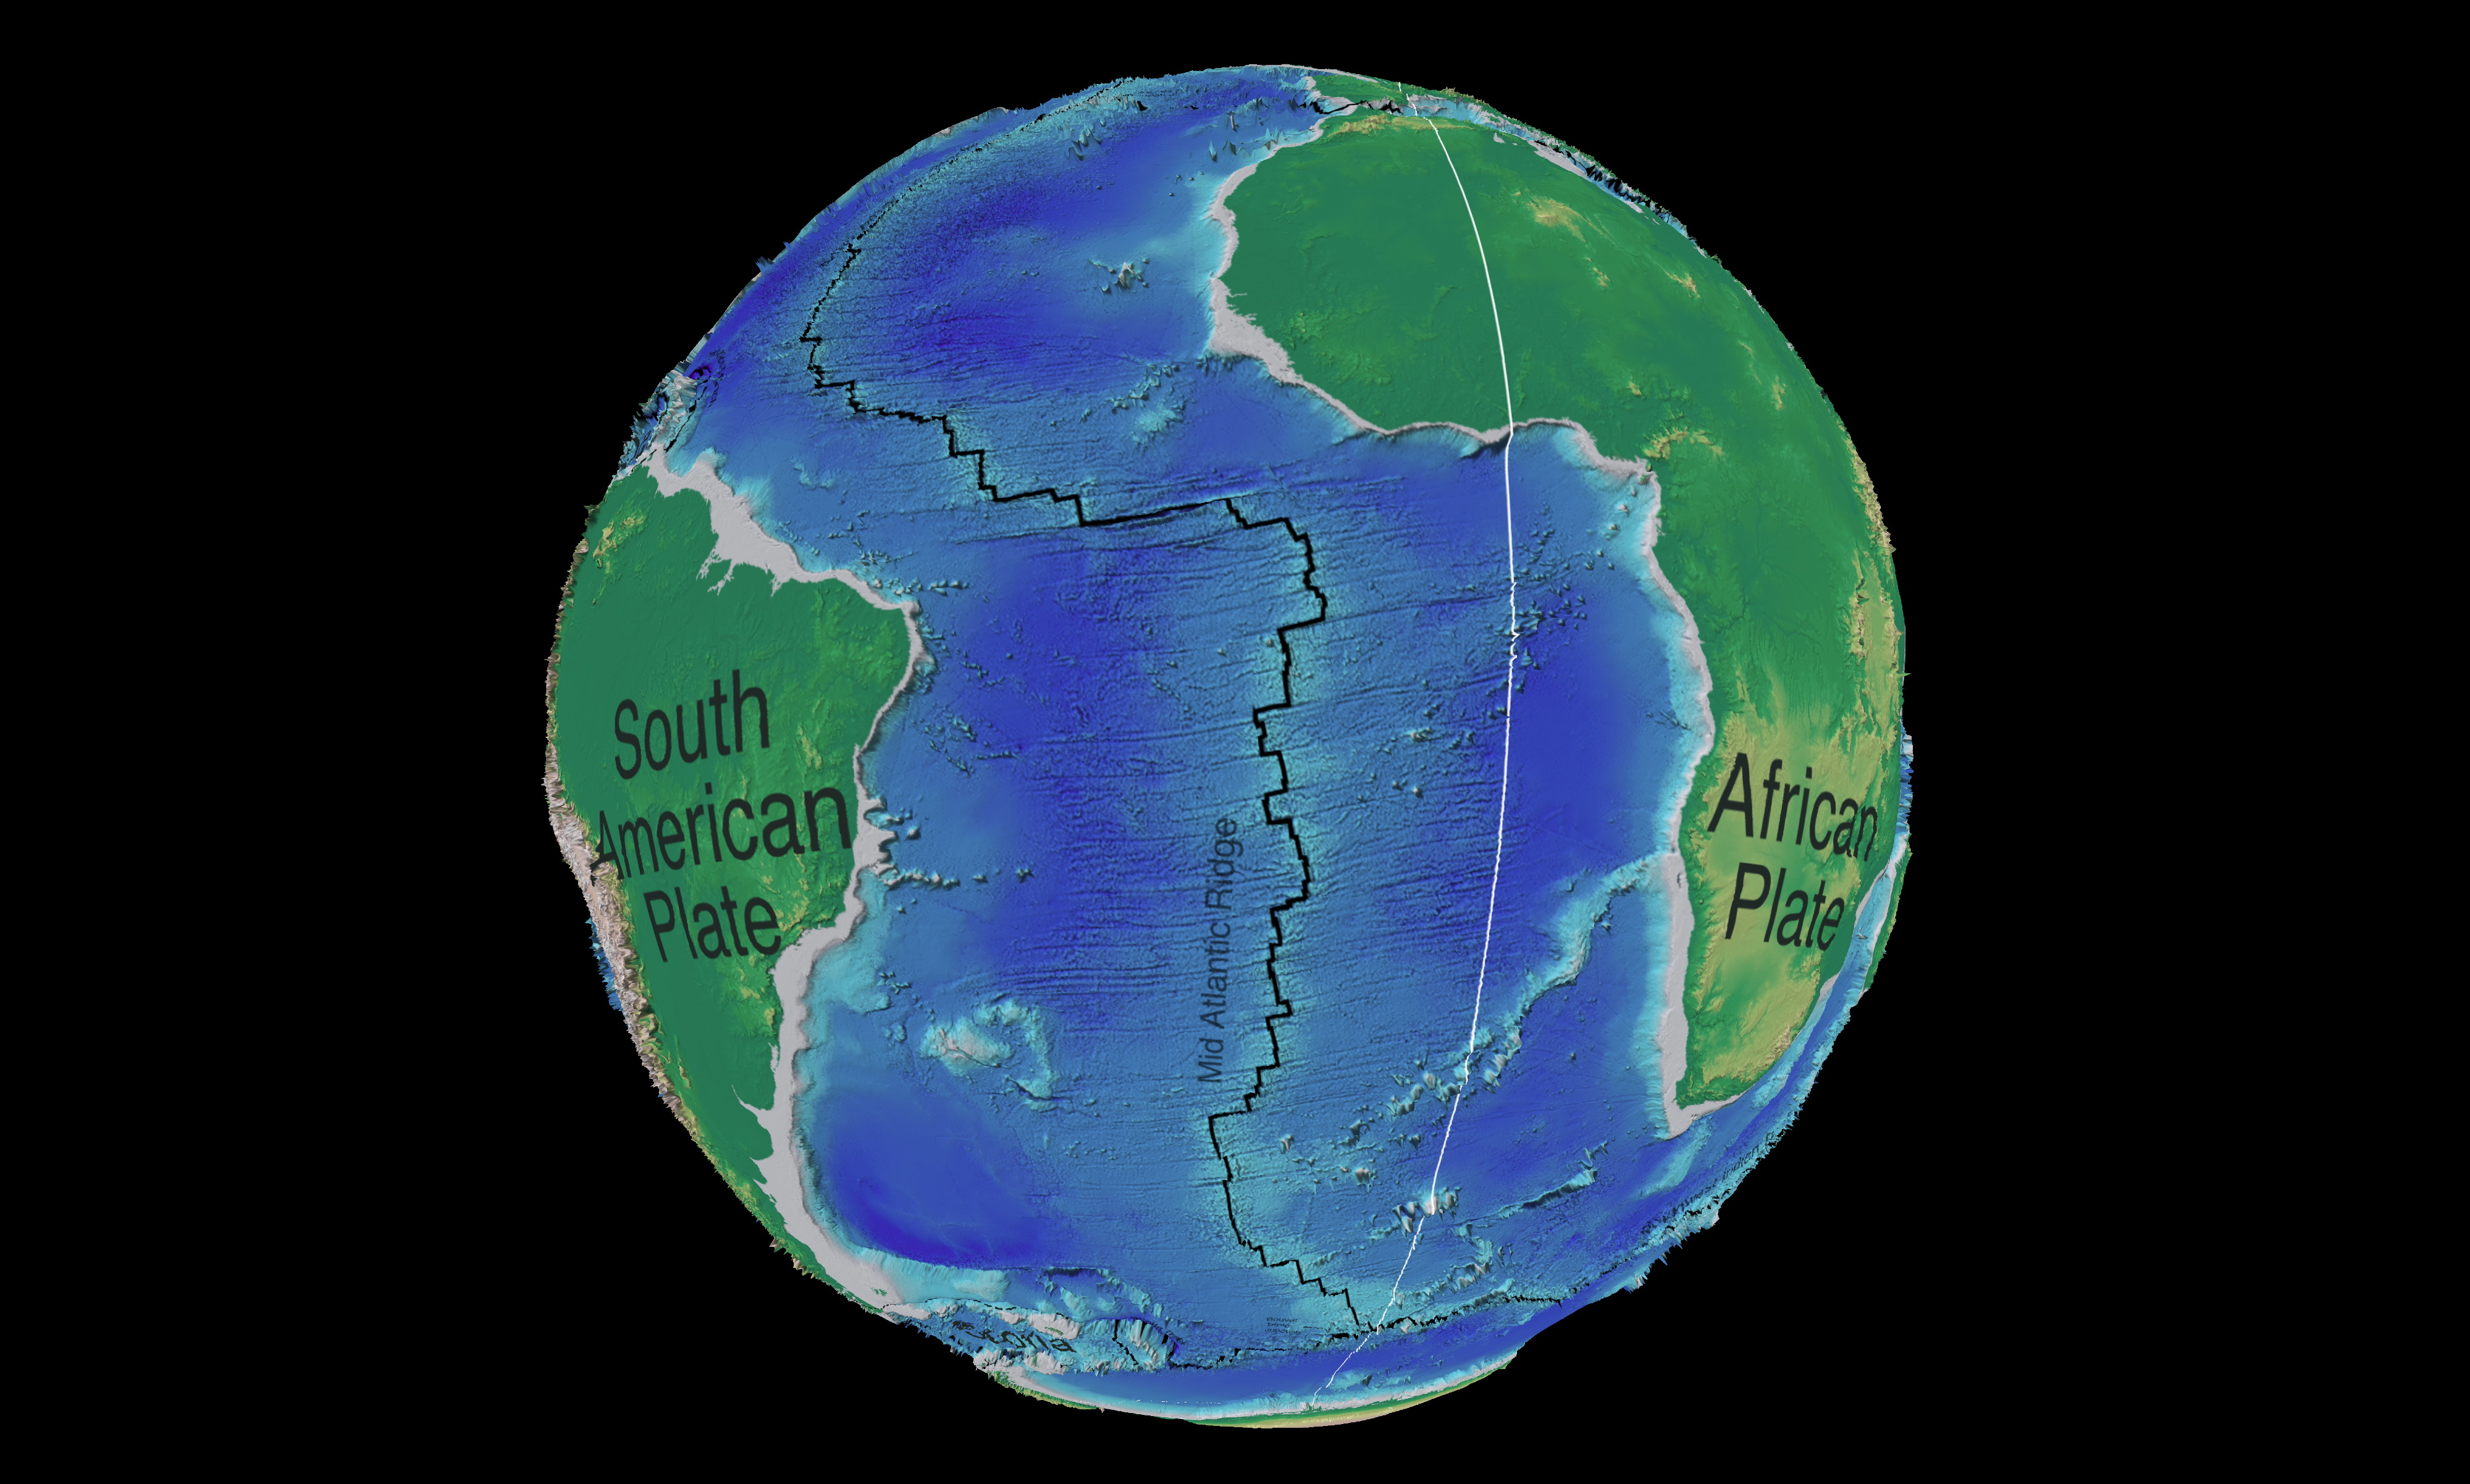 The Mid-Atlantic Ridge (MAR) in the South Atlantic Ocean